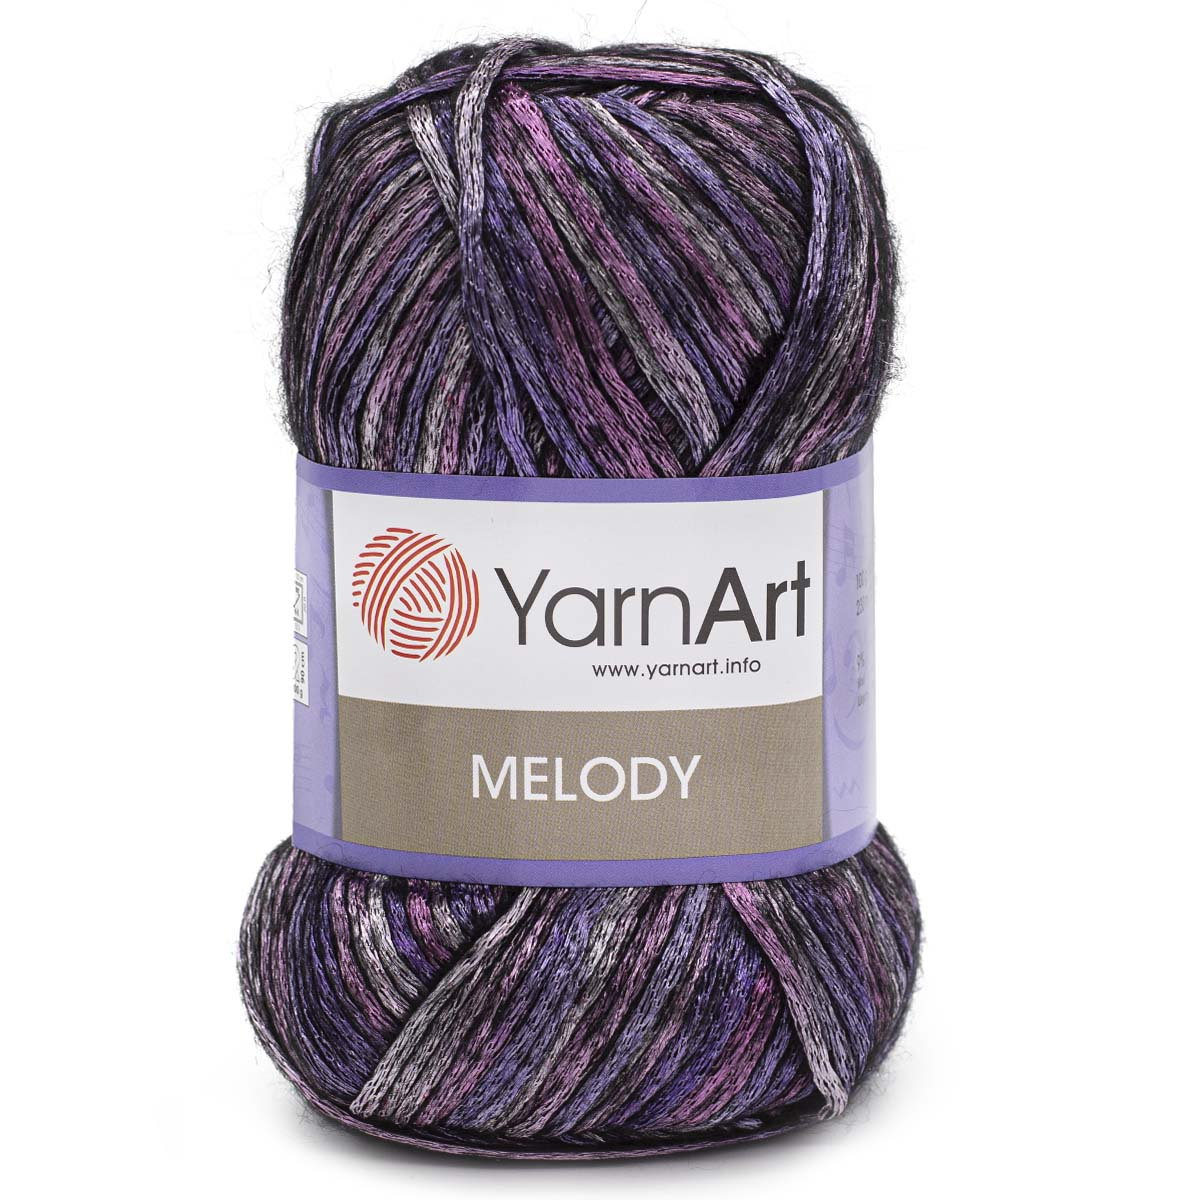 Пряжа YarnArt 'Melody' 100гр 230м (9% шерсть, 21% акрил, 70% полиамид)